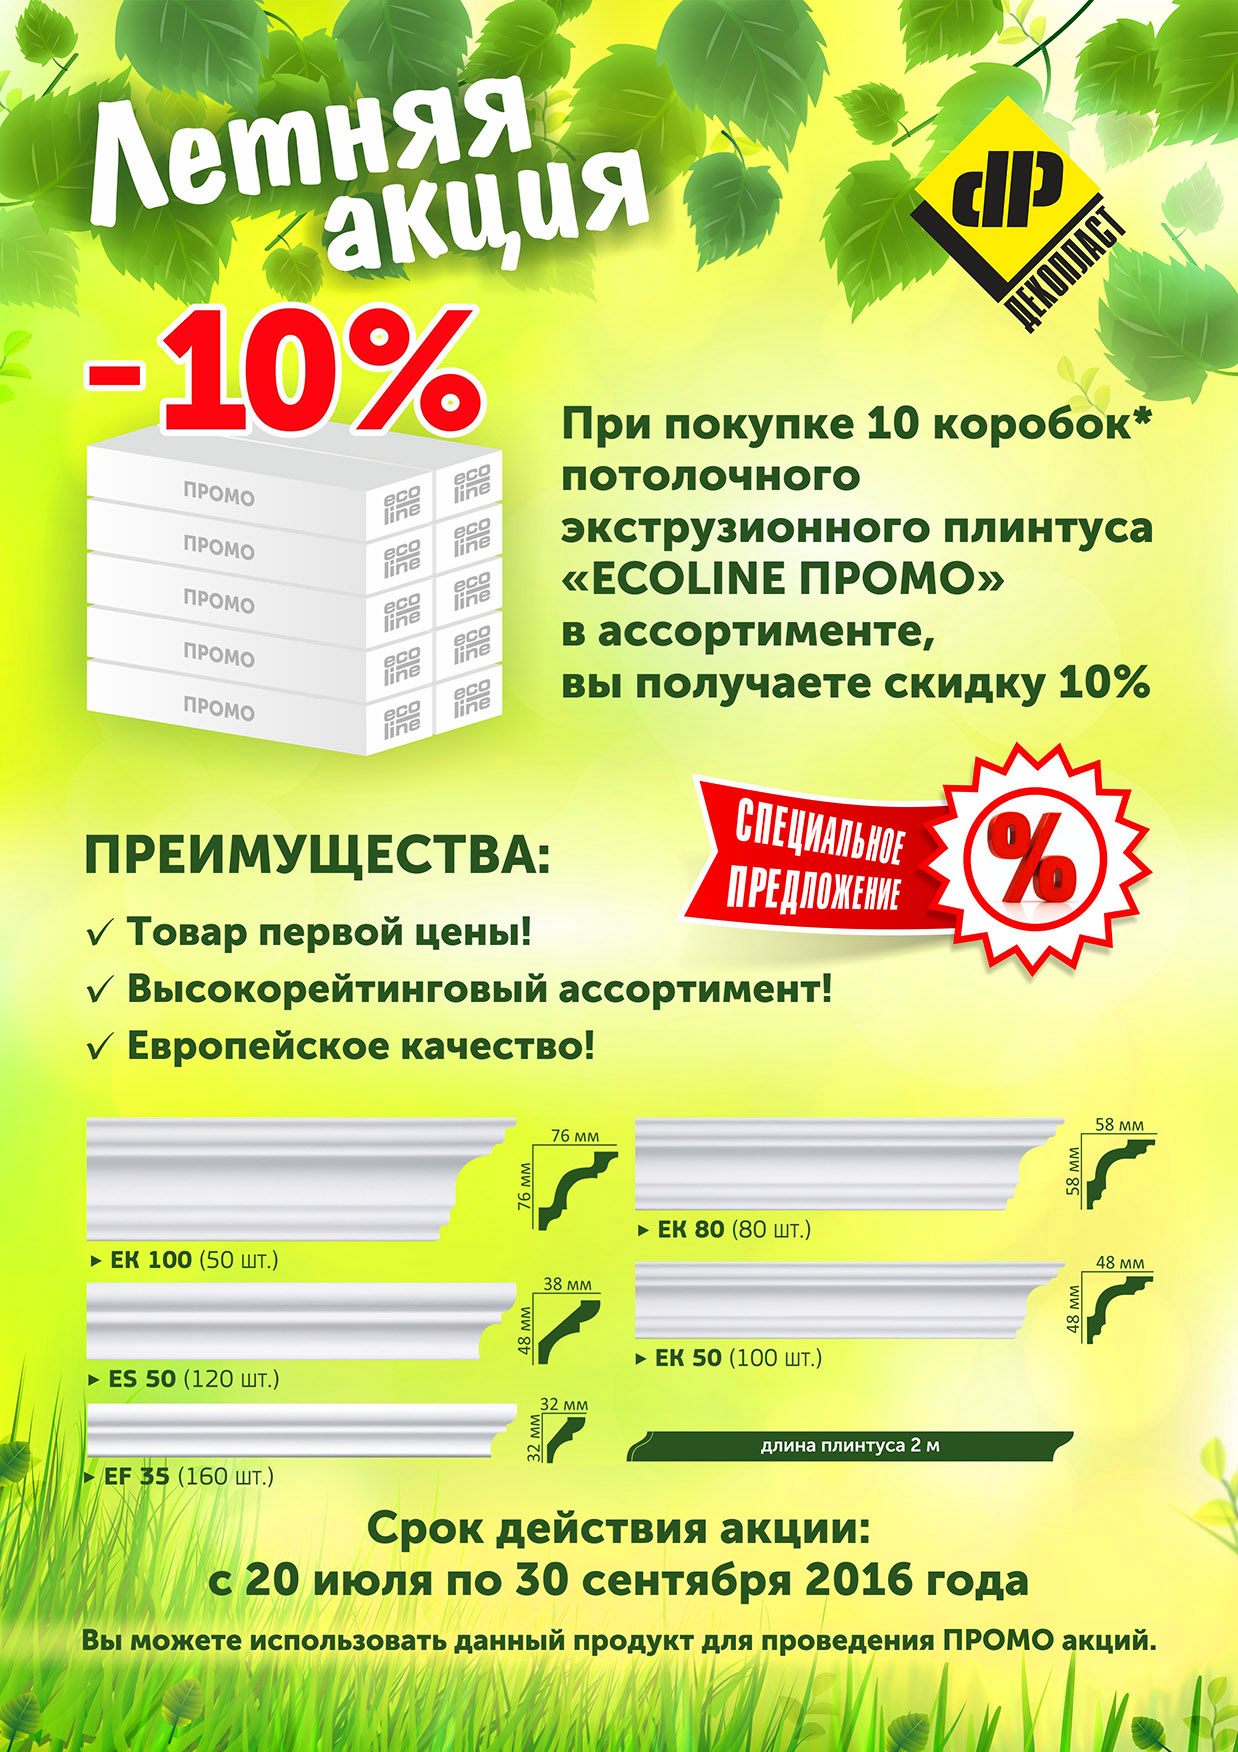 Акция Ecoline promo_30.09